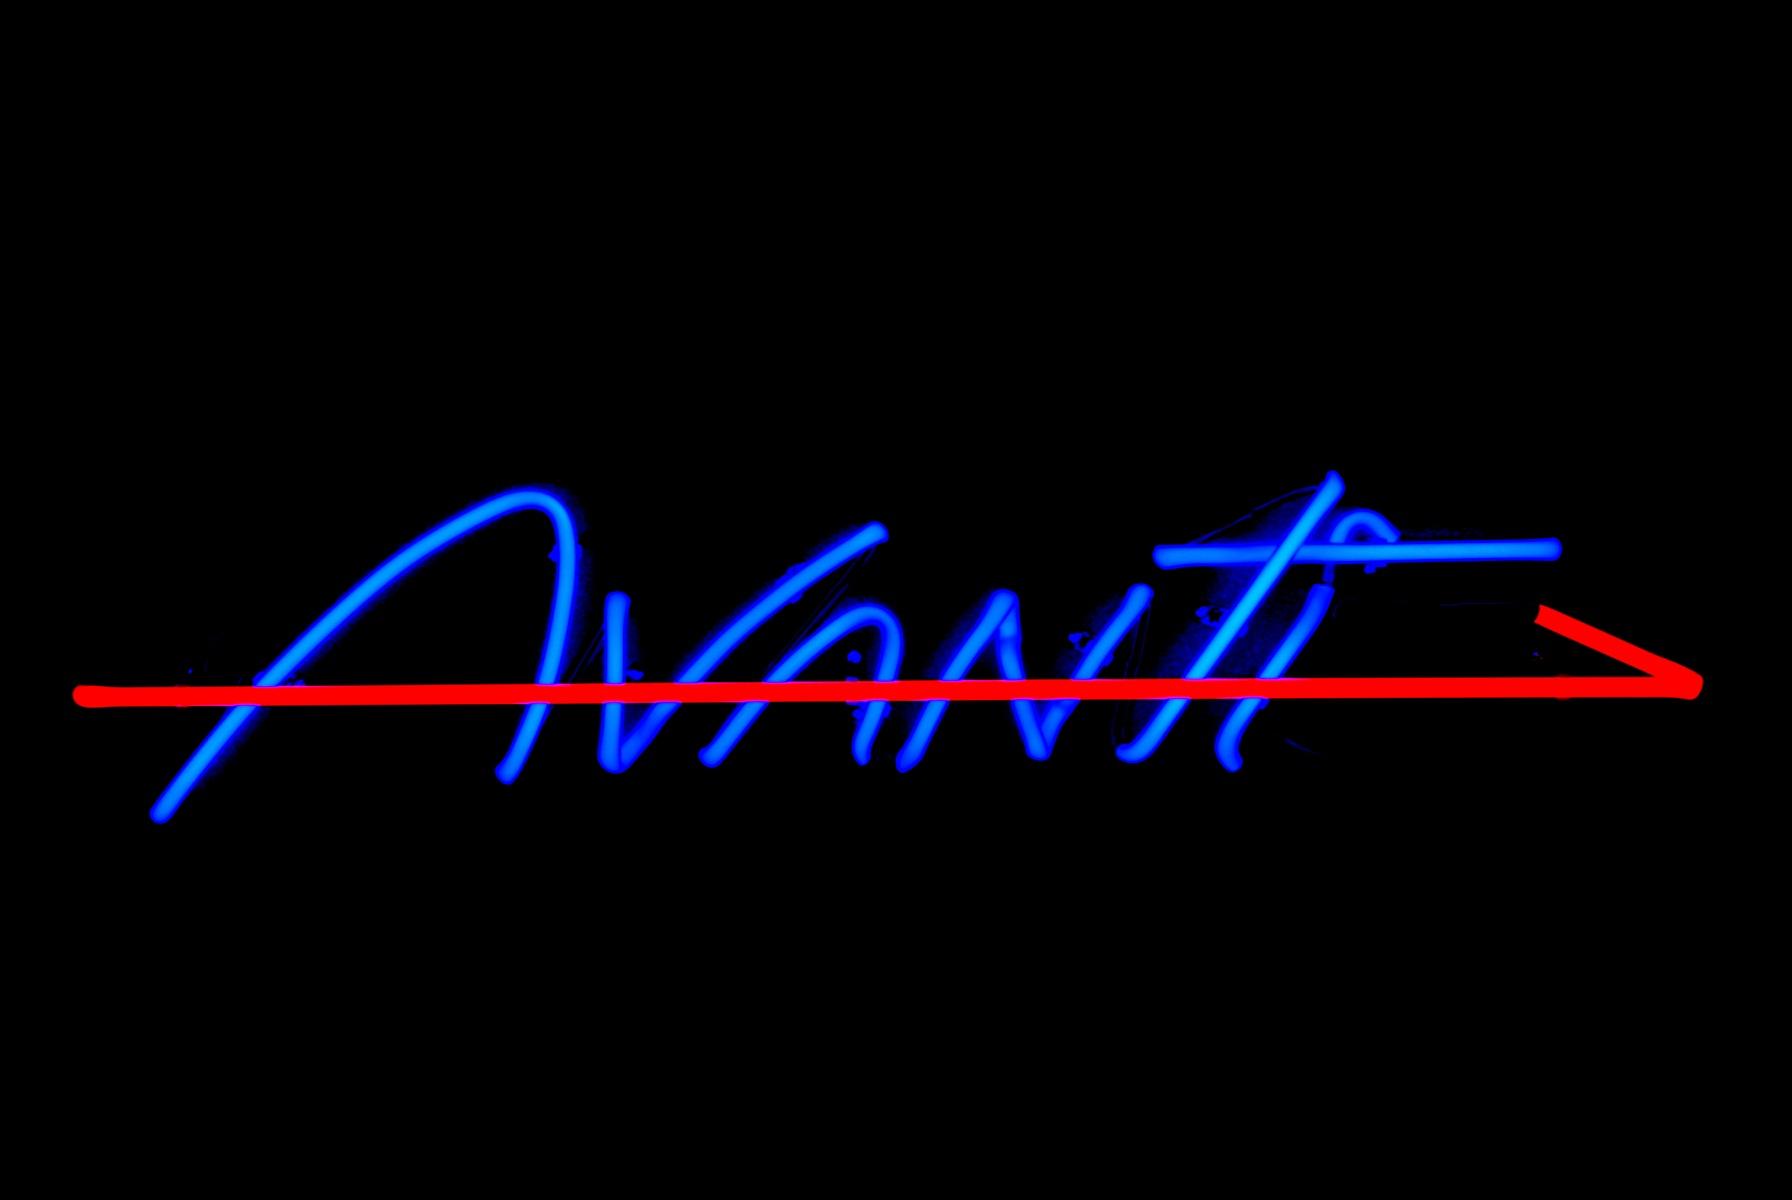 AVANTI NEON SIGNS BY JOHN BARTON - BartonNeonMagic.com